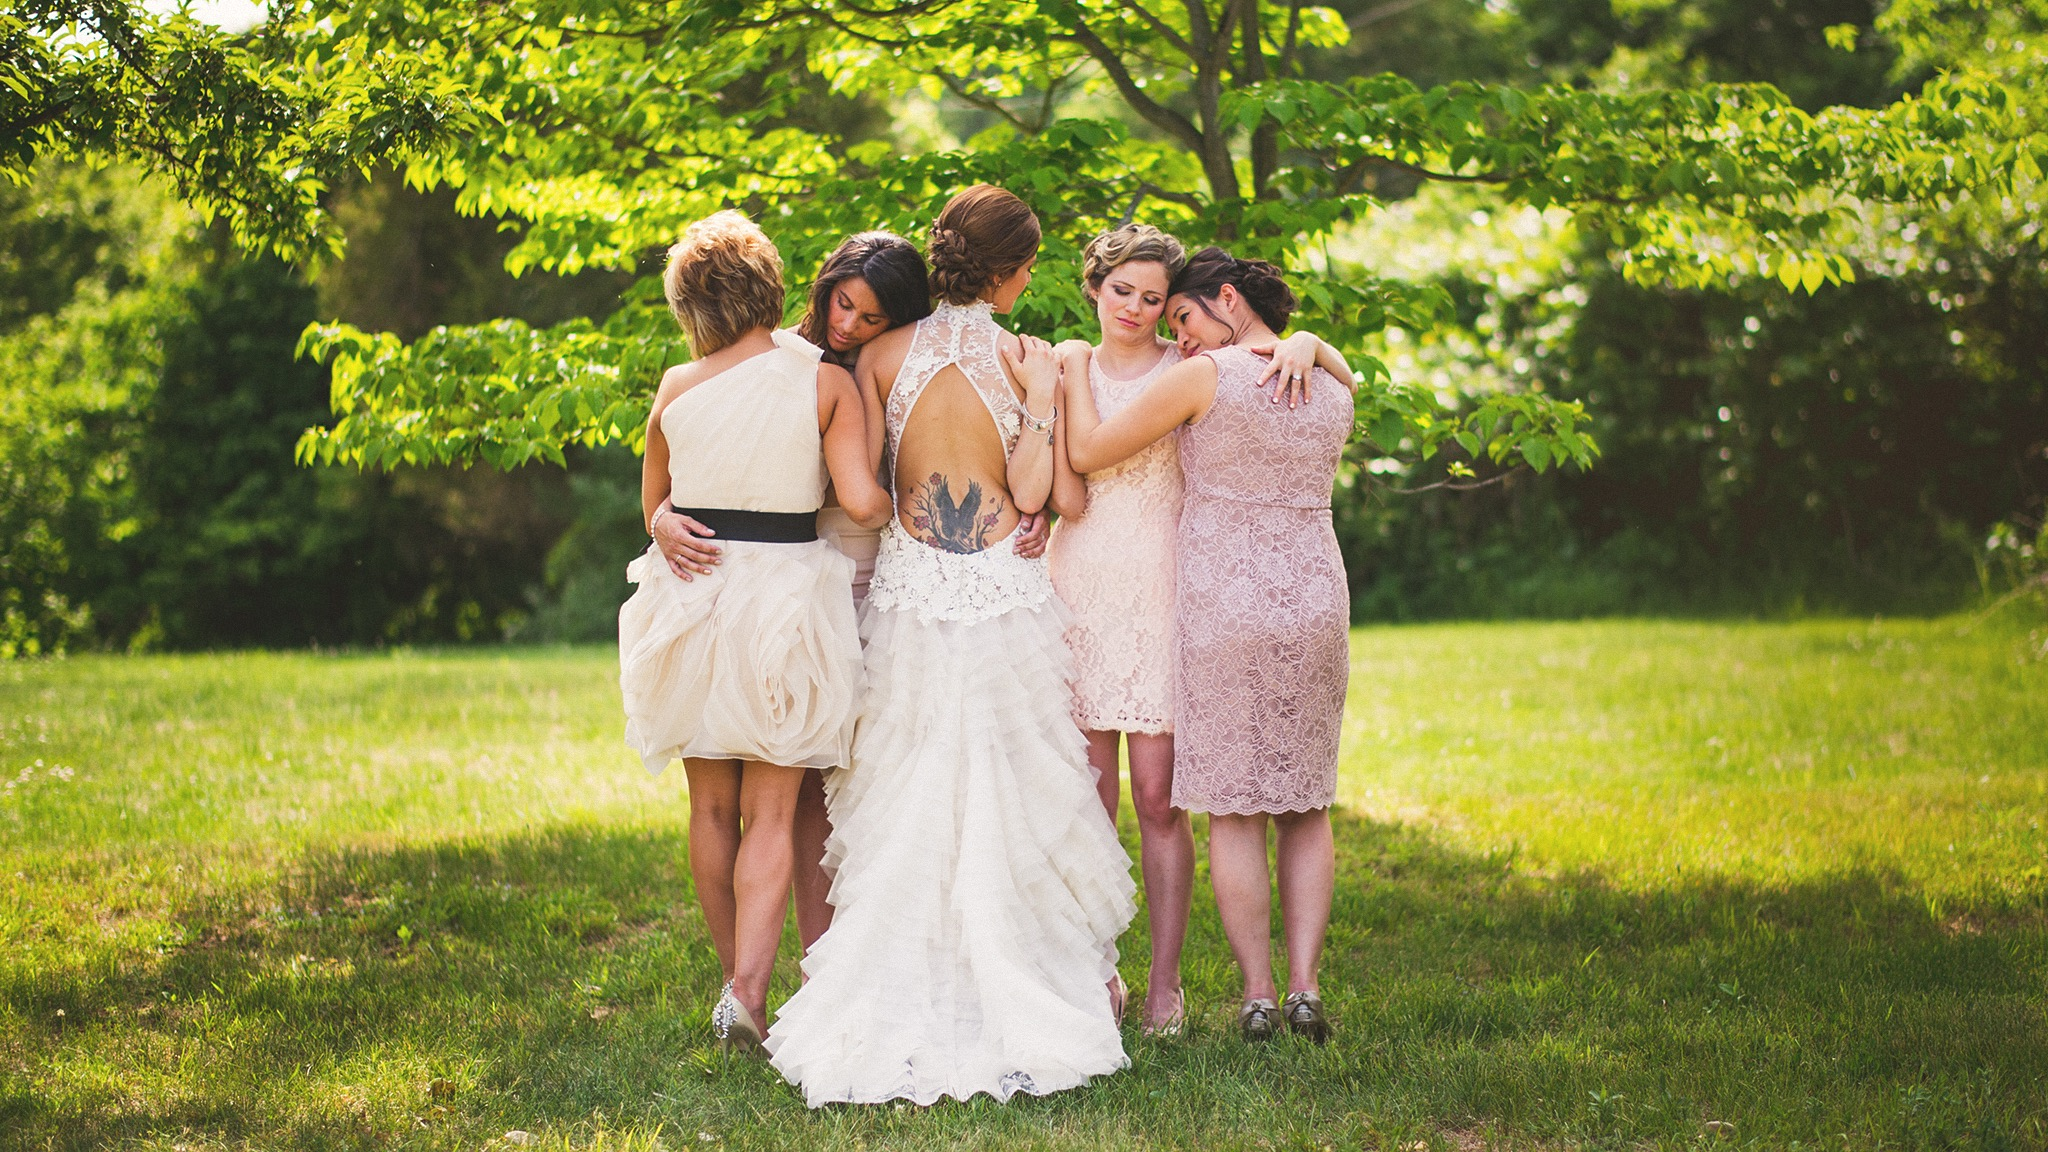 37-jacks-barn-bridesmaids-photos.jpg